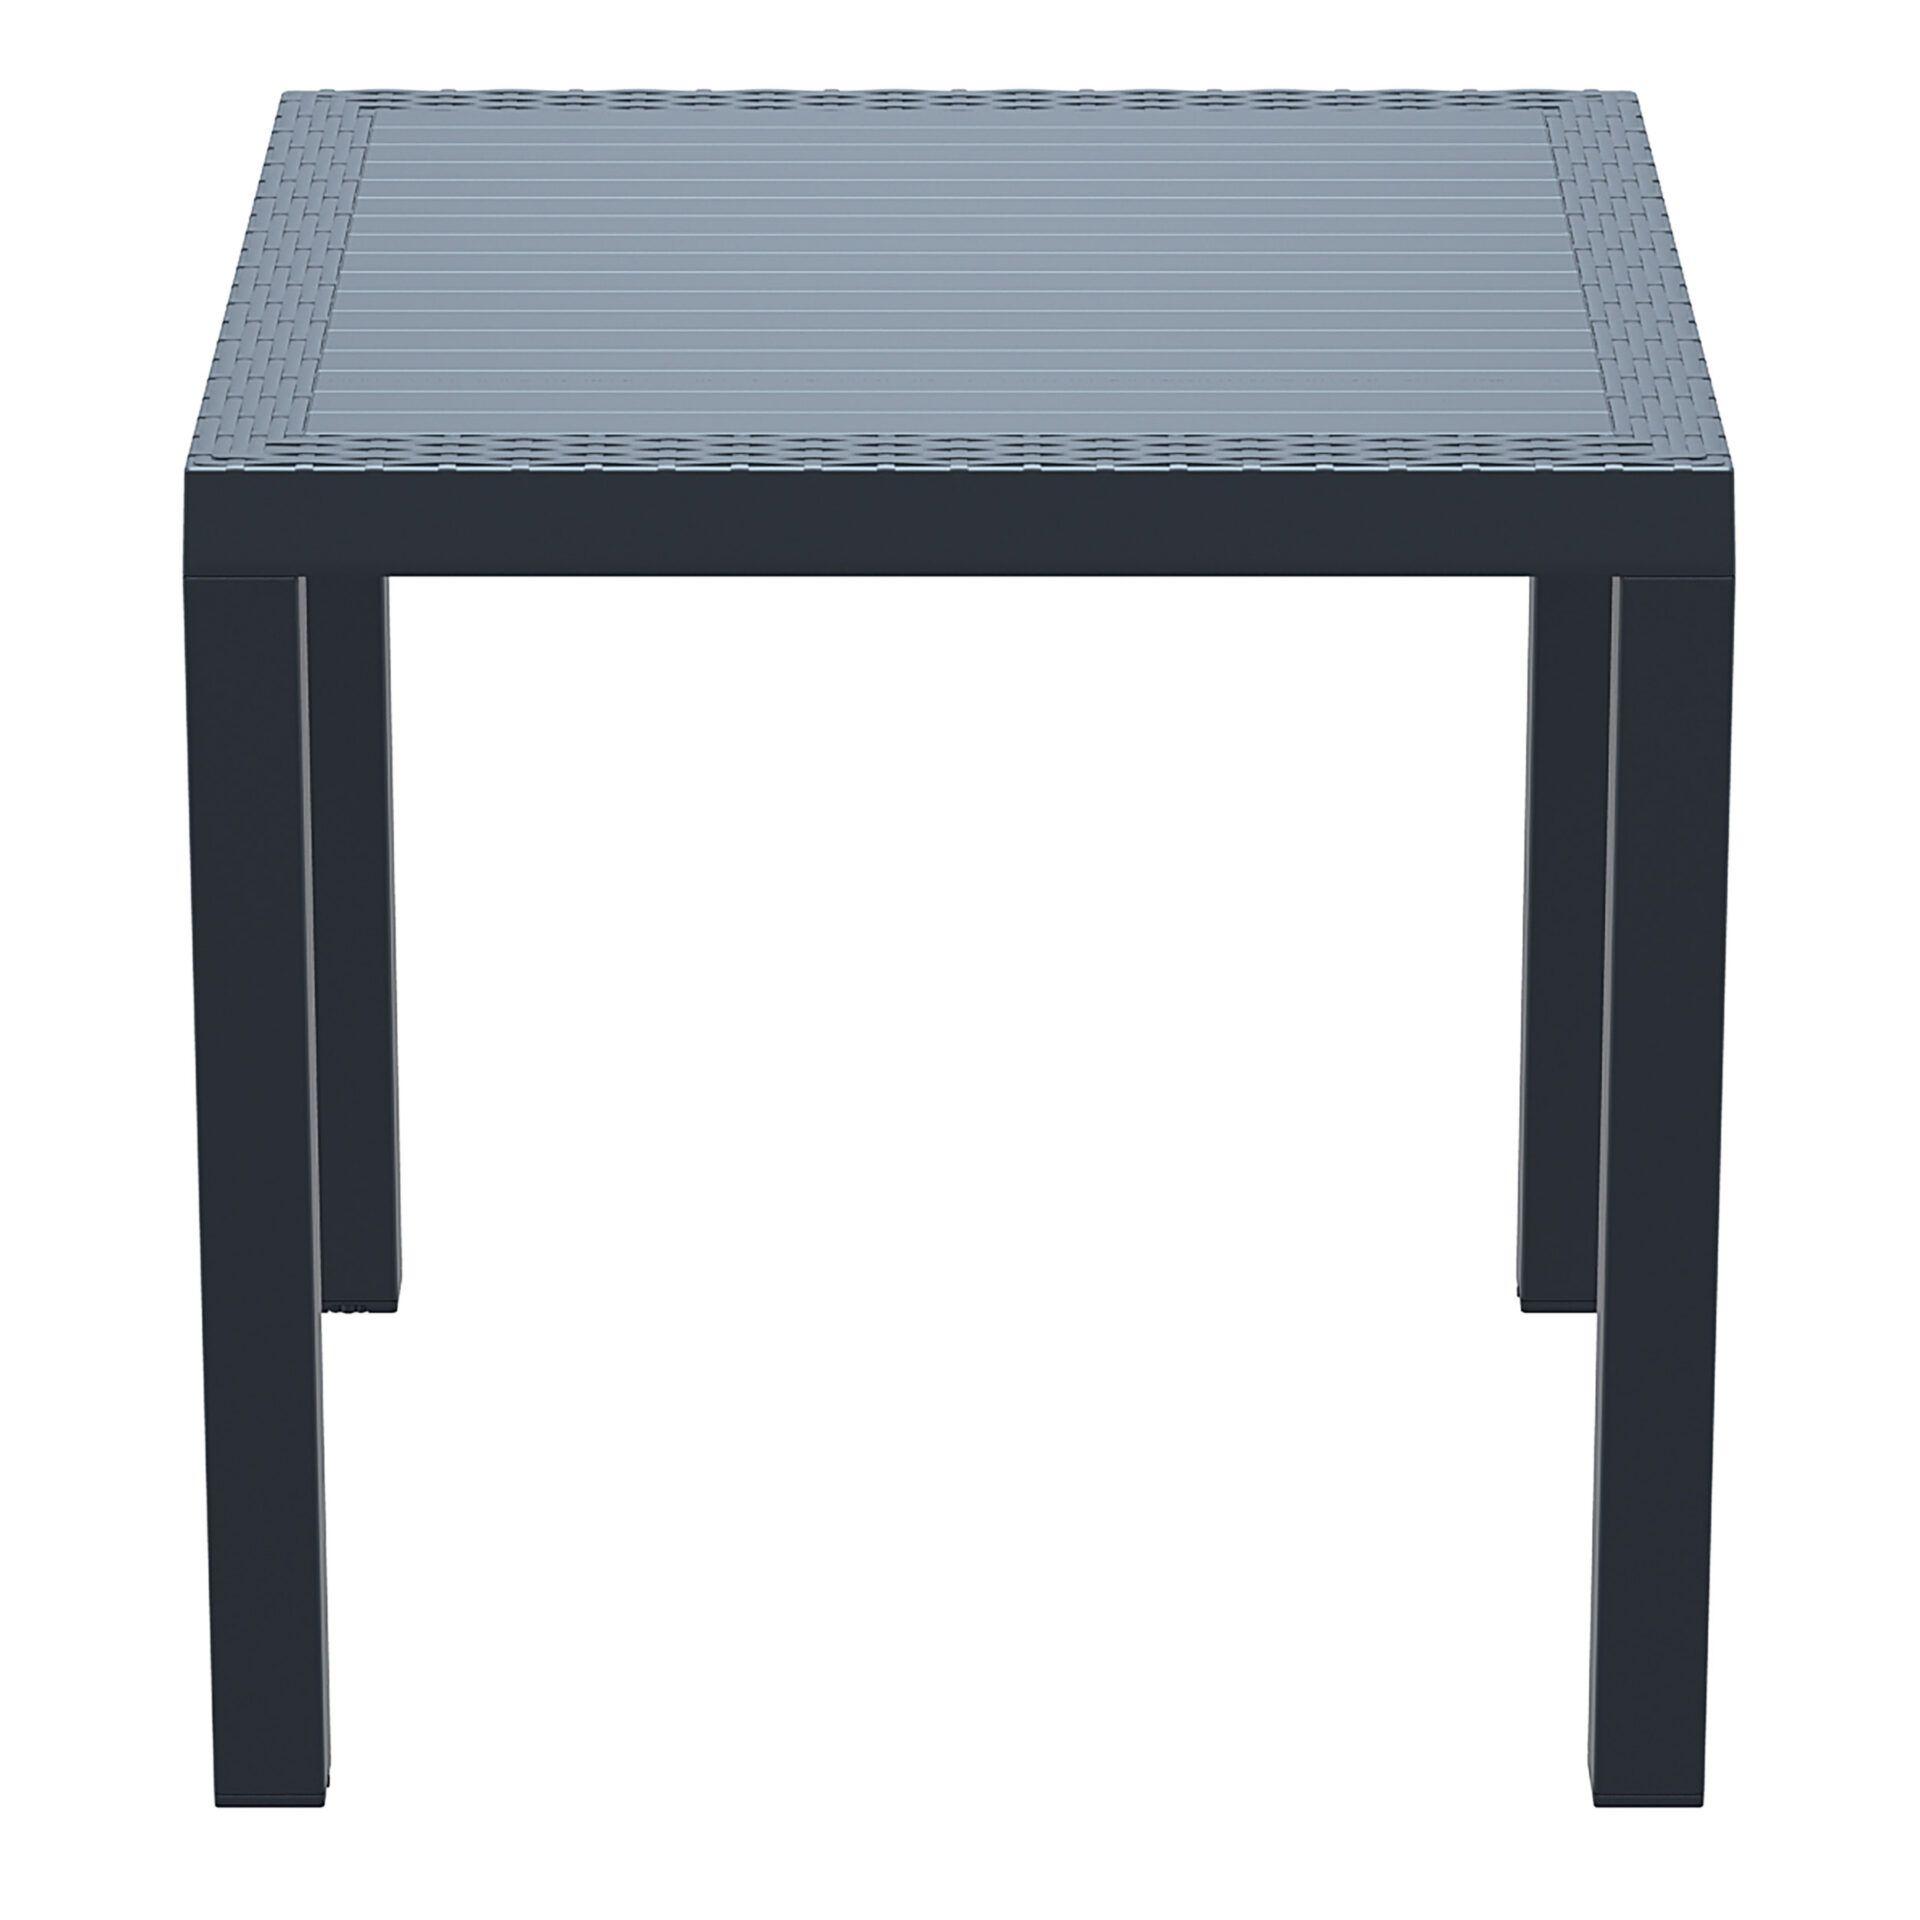 outdoor resin rattan cafe plastic top bali table 80 darkgrey side